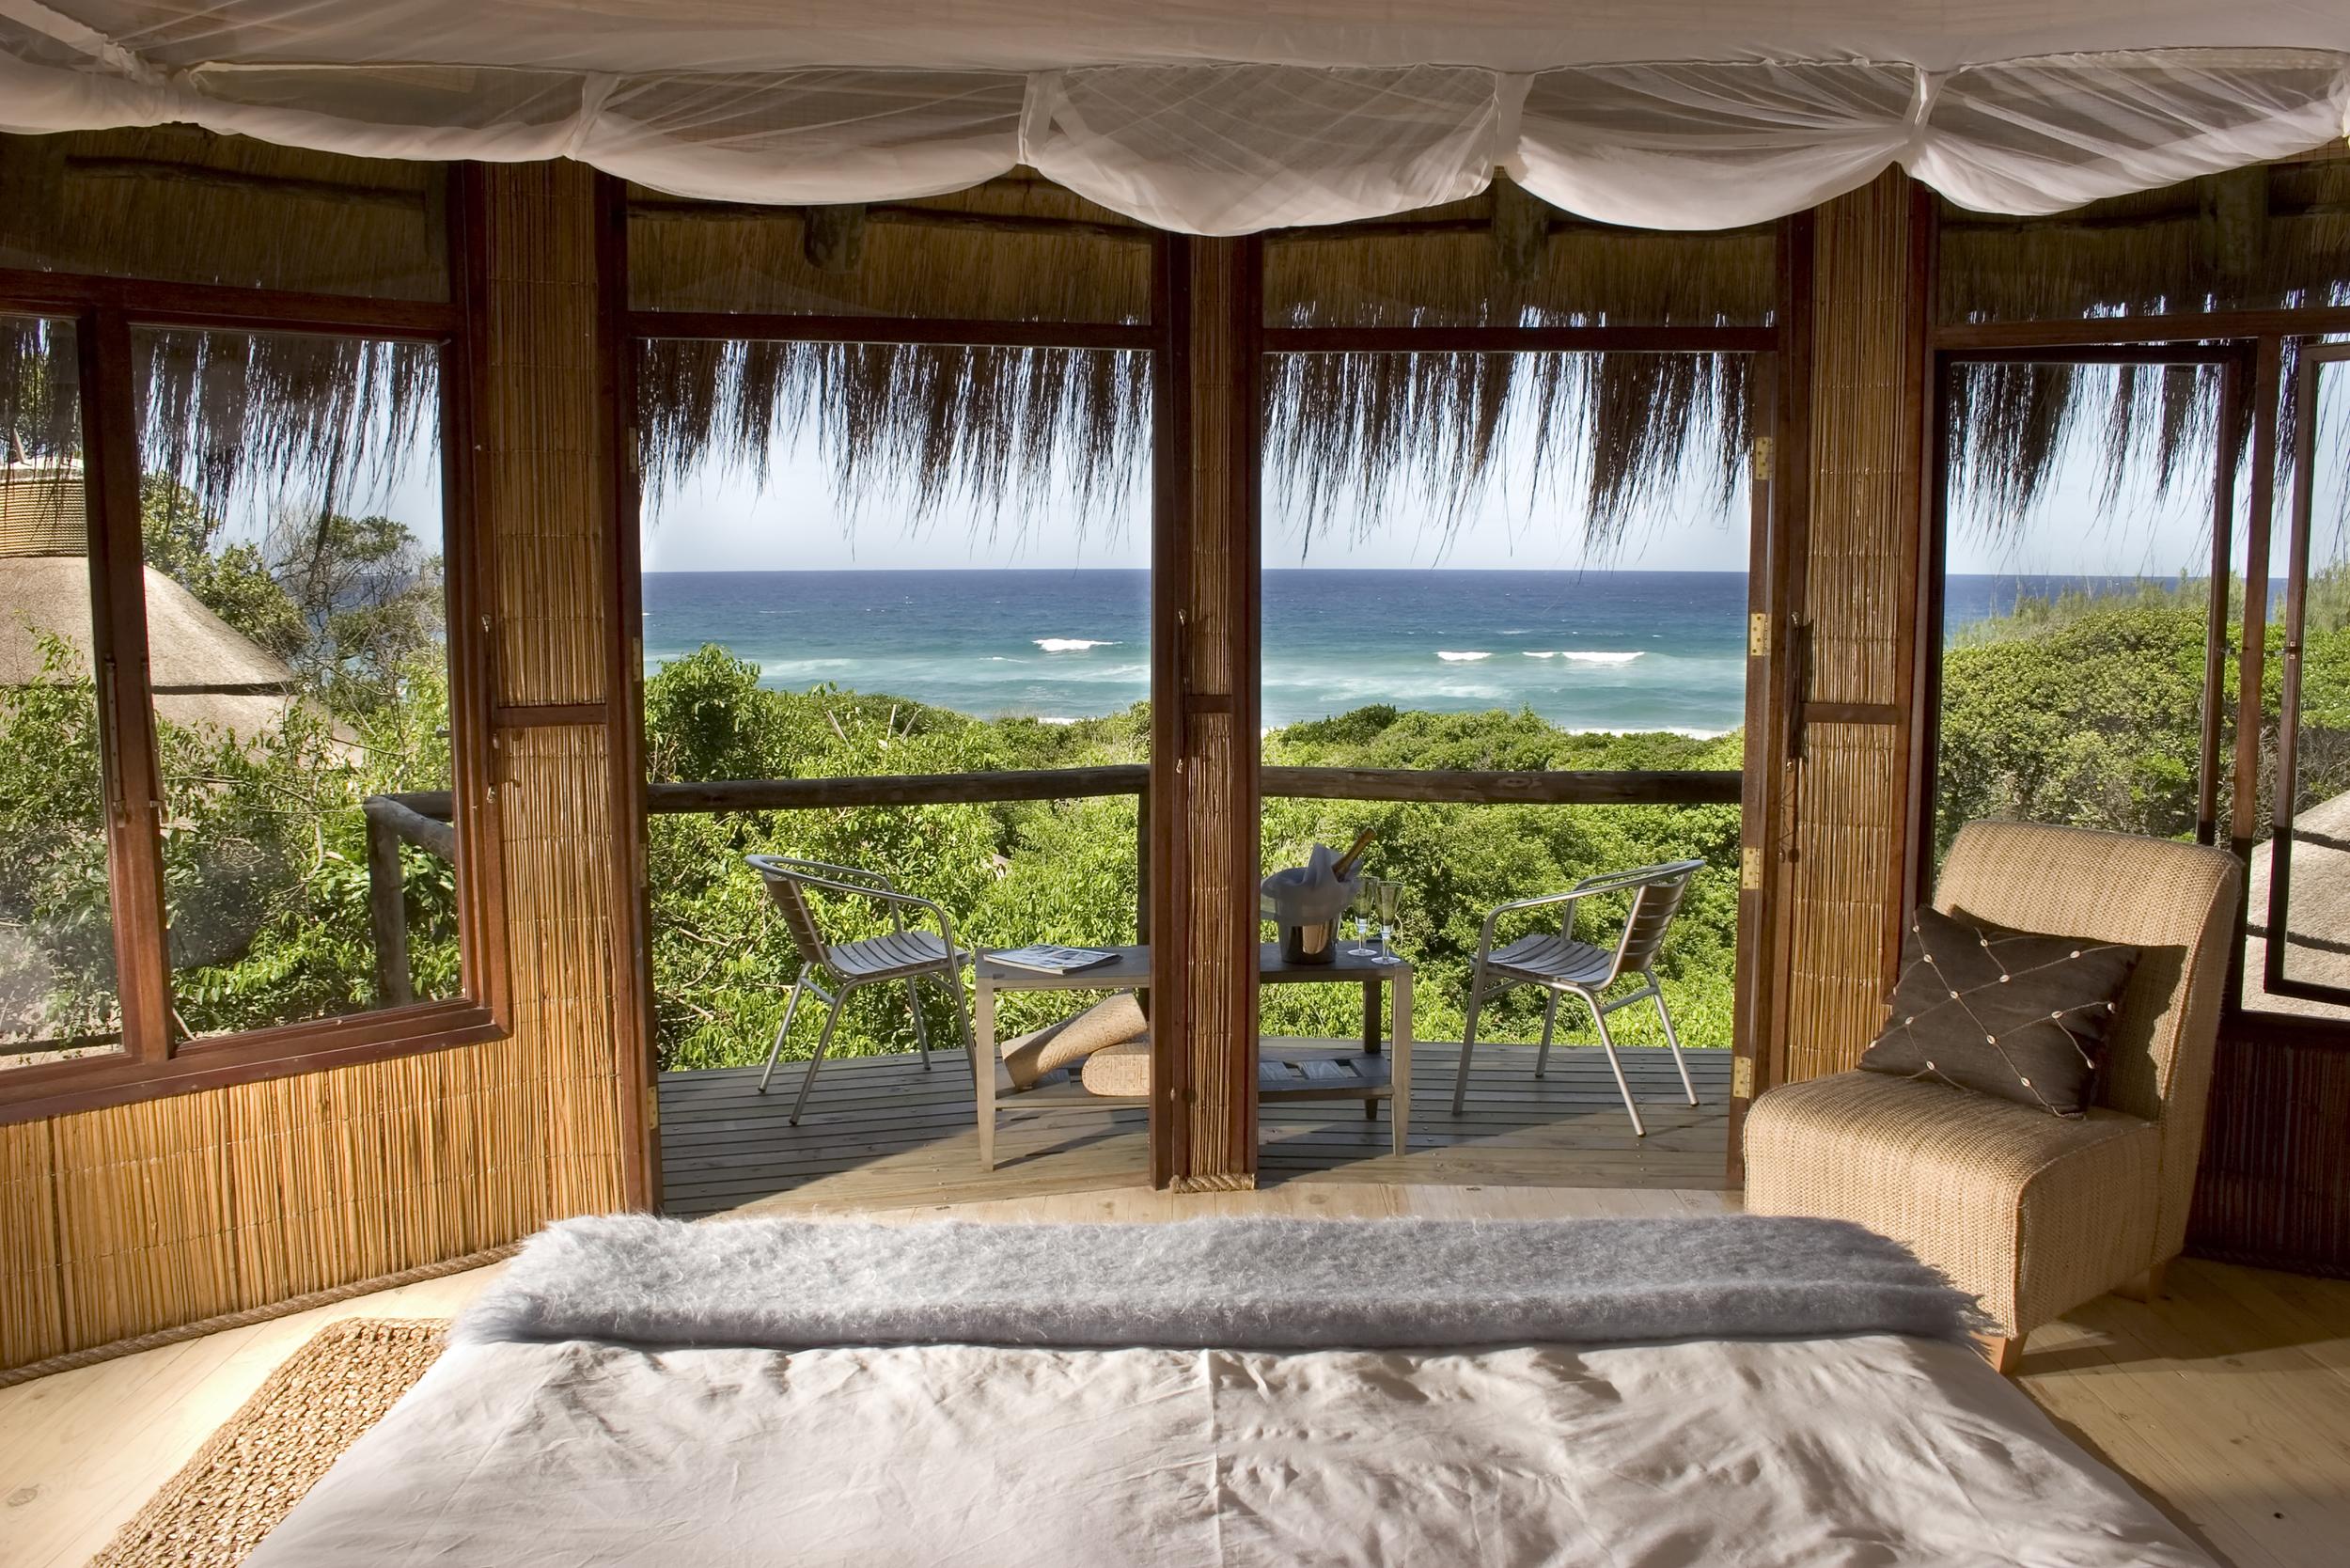 Voyage de noces Joyaux Sud Africain - Thonga Beach lodge